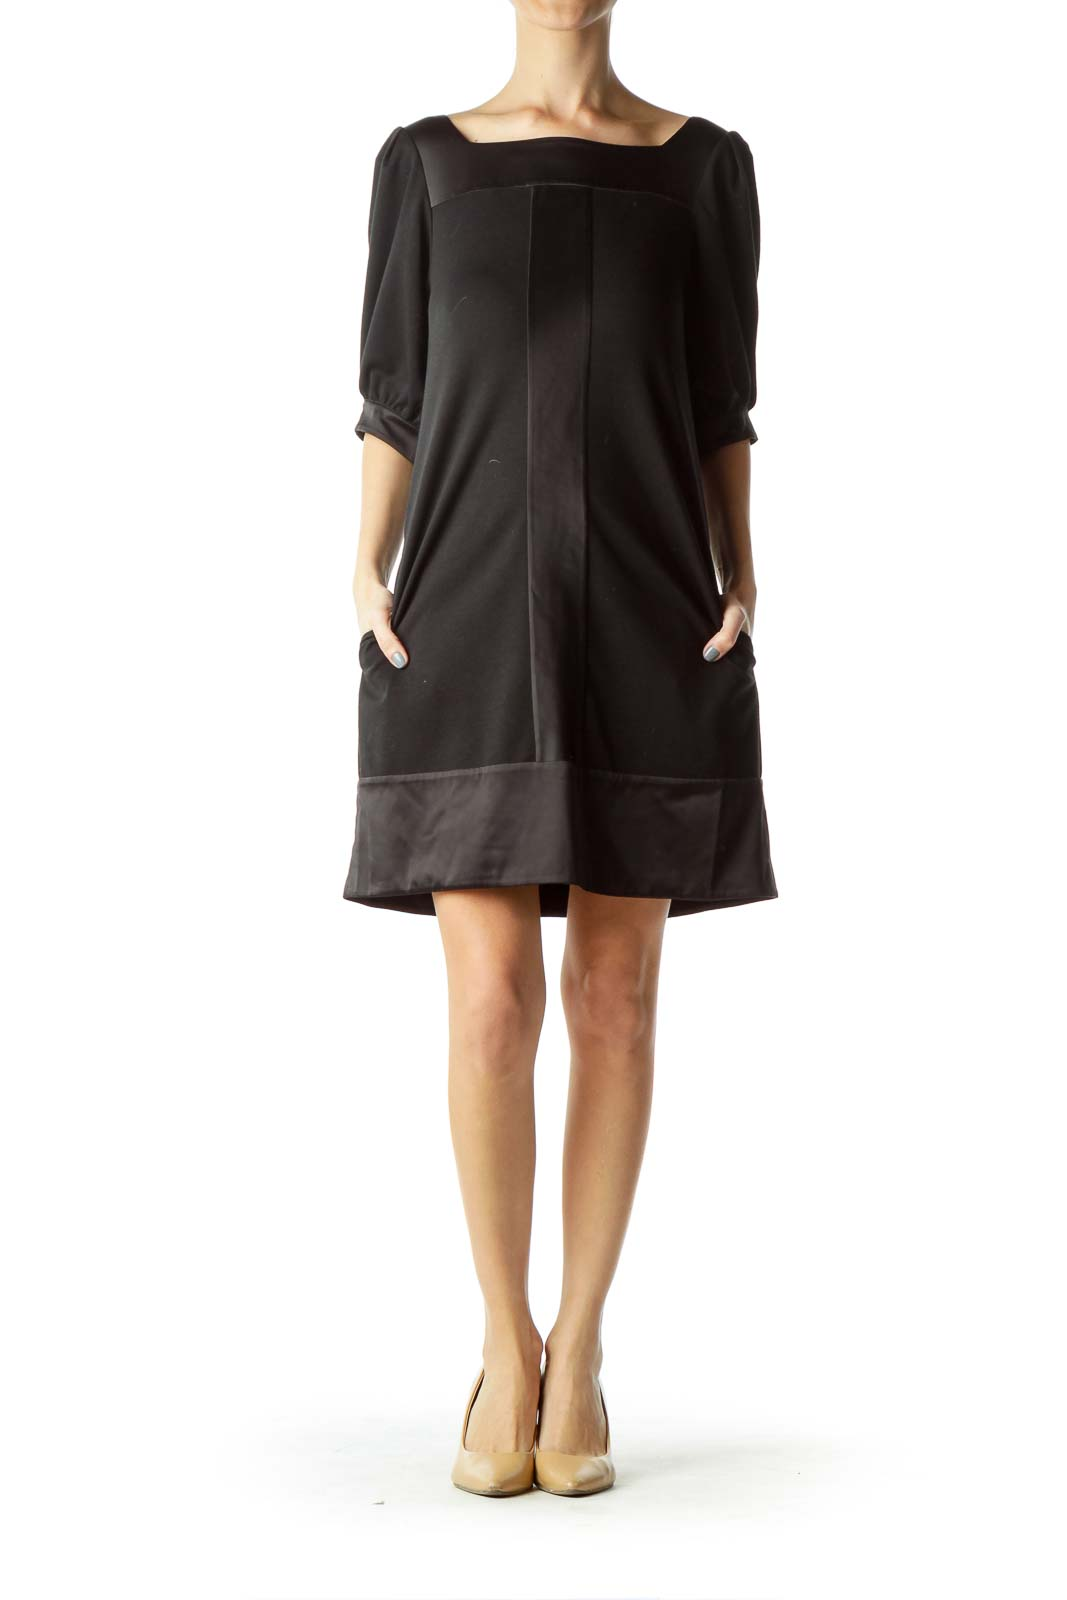 Black Satin Detailed Doll Dress